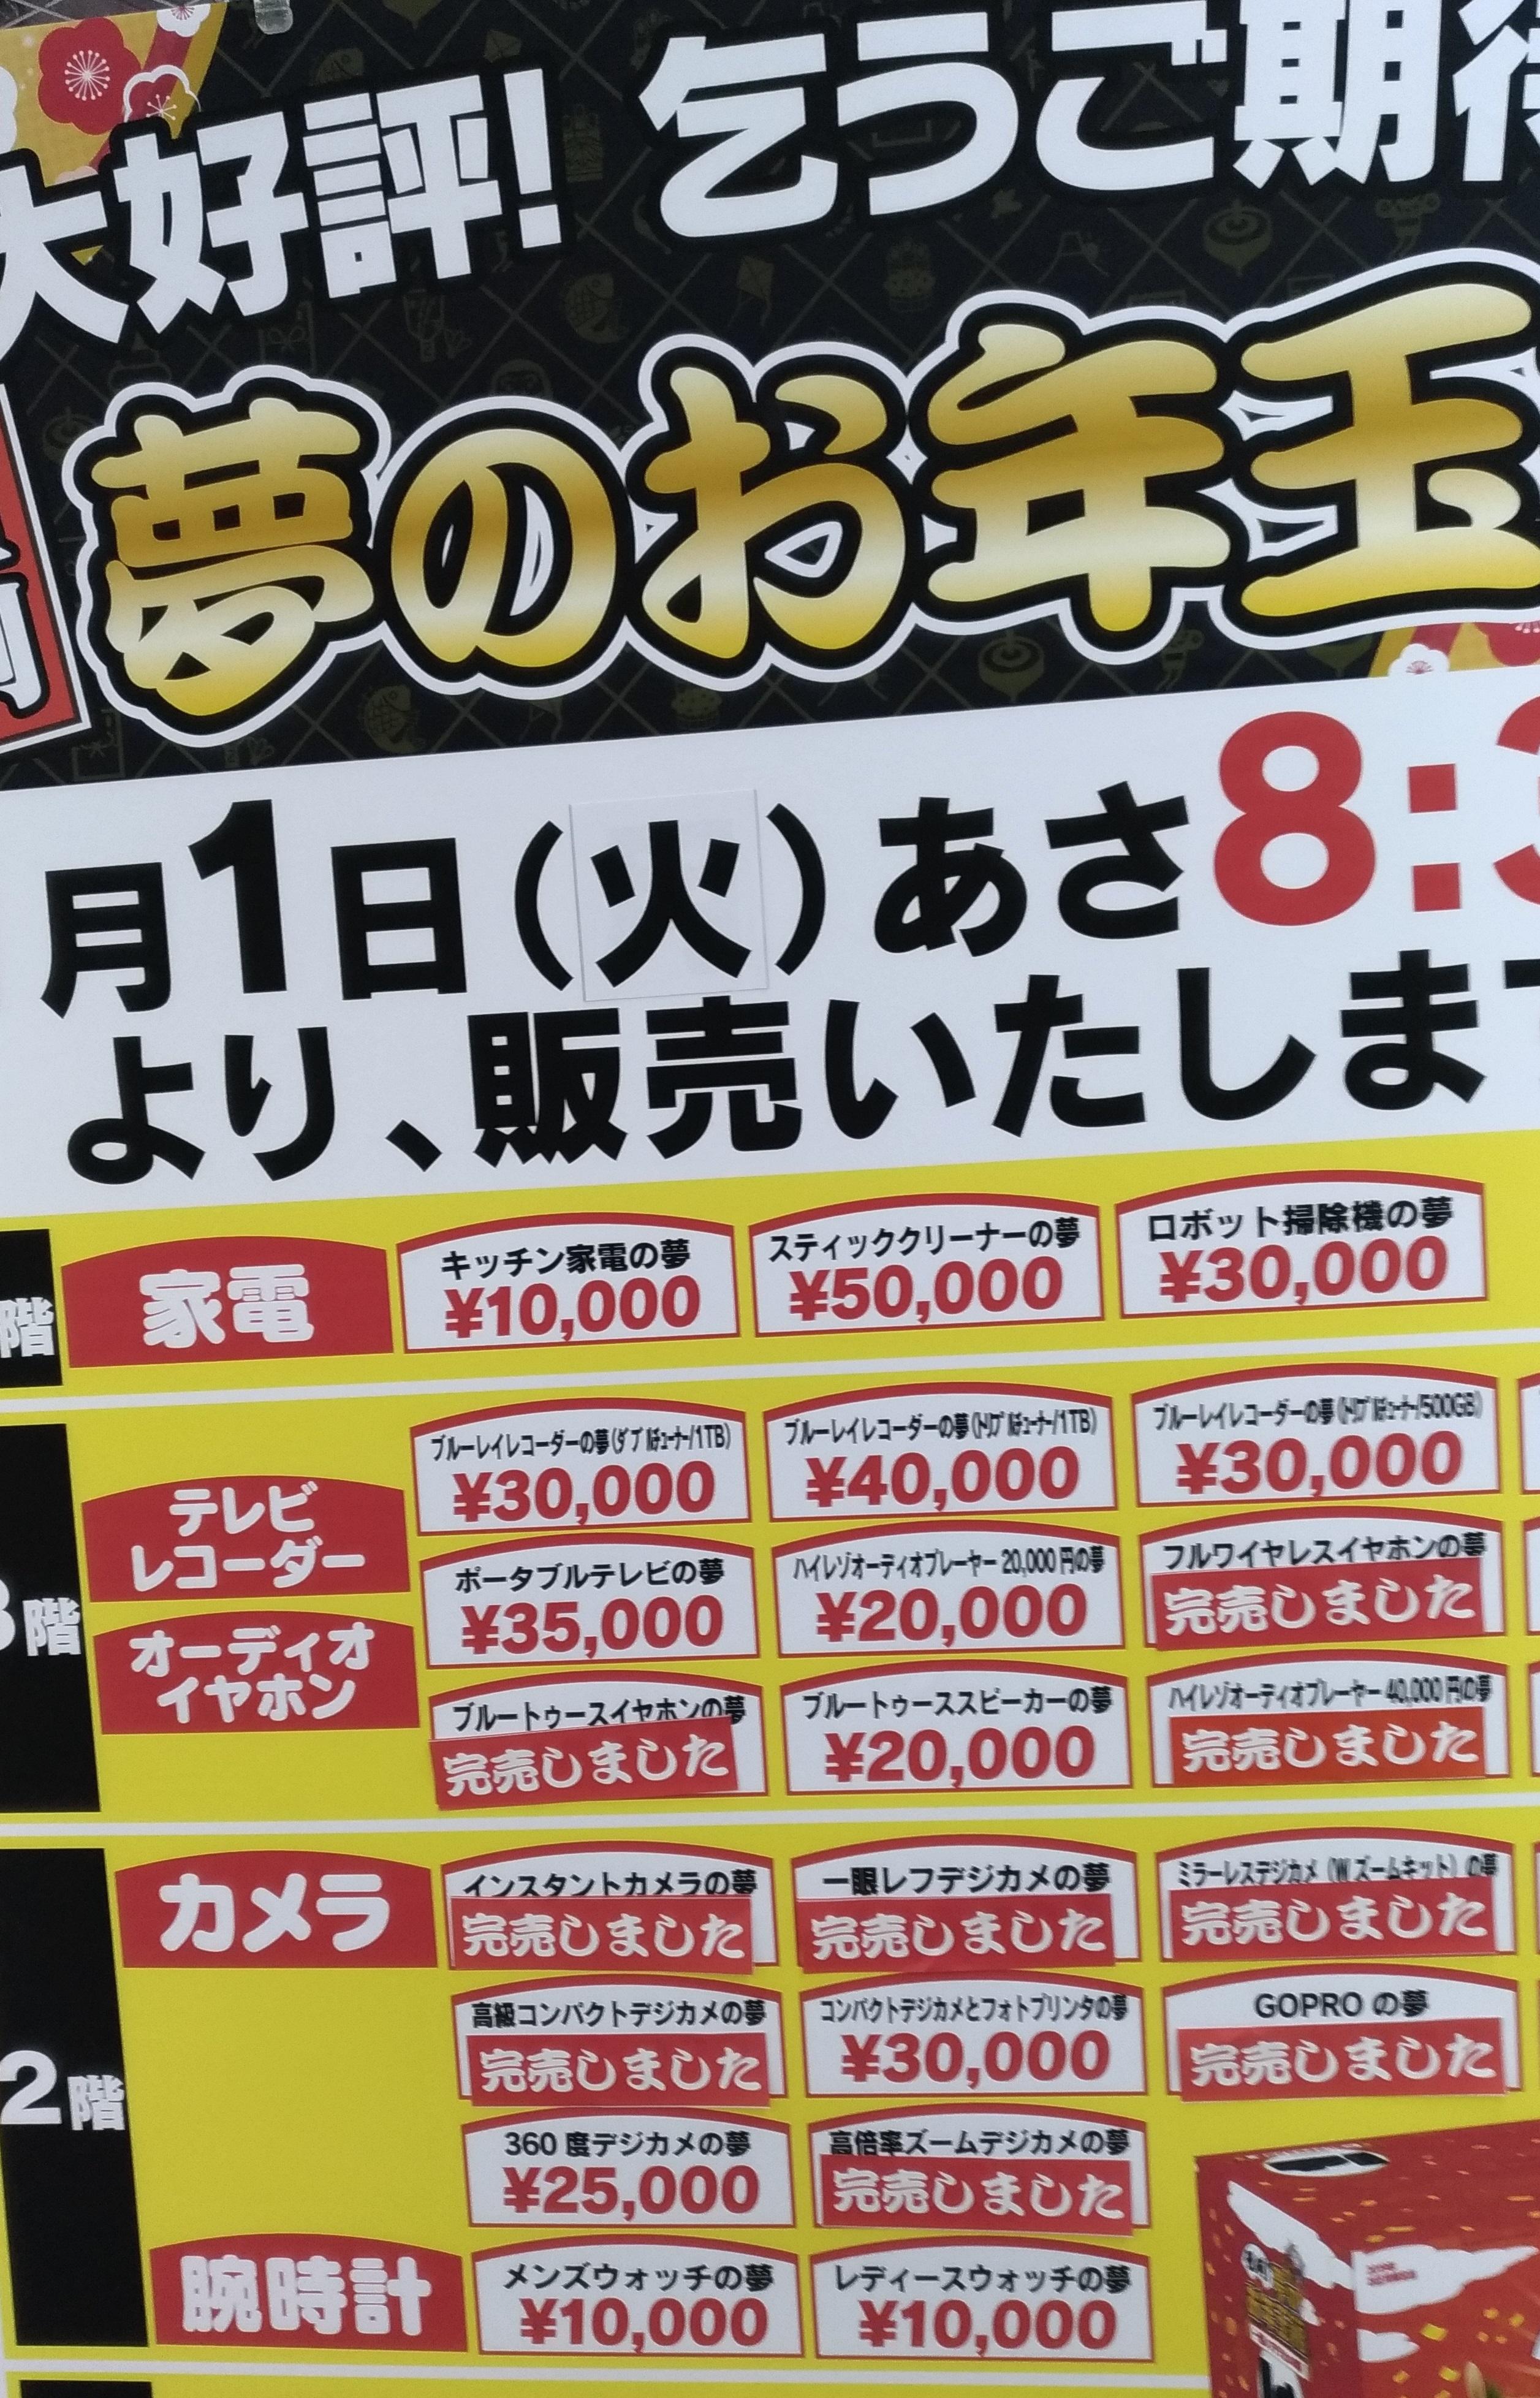 osaka_yodobashiumeda_fukubukuro_2019.jpg